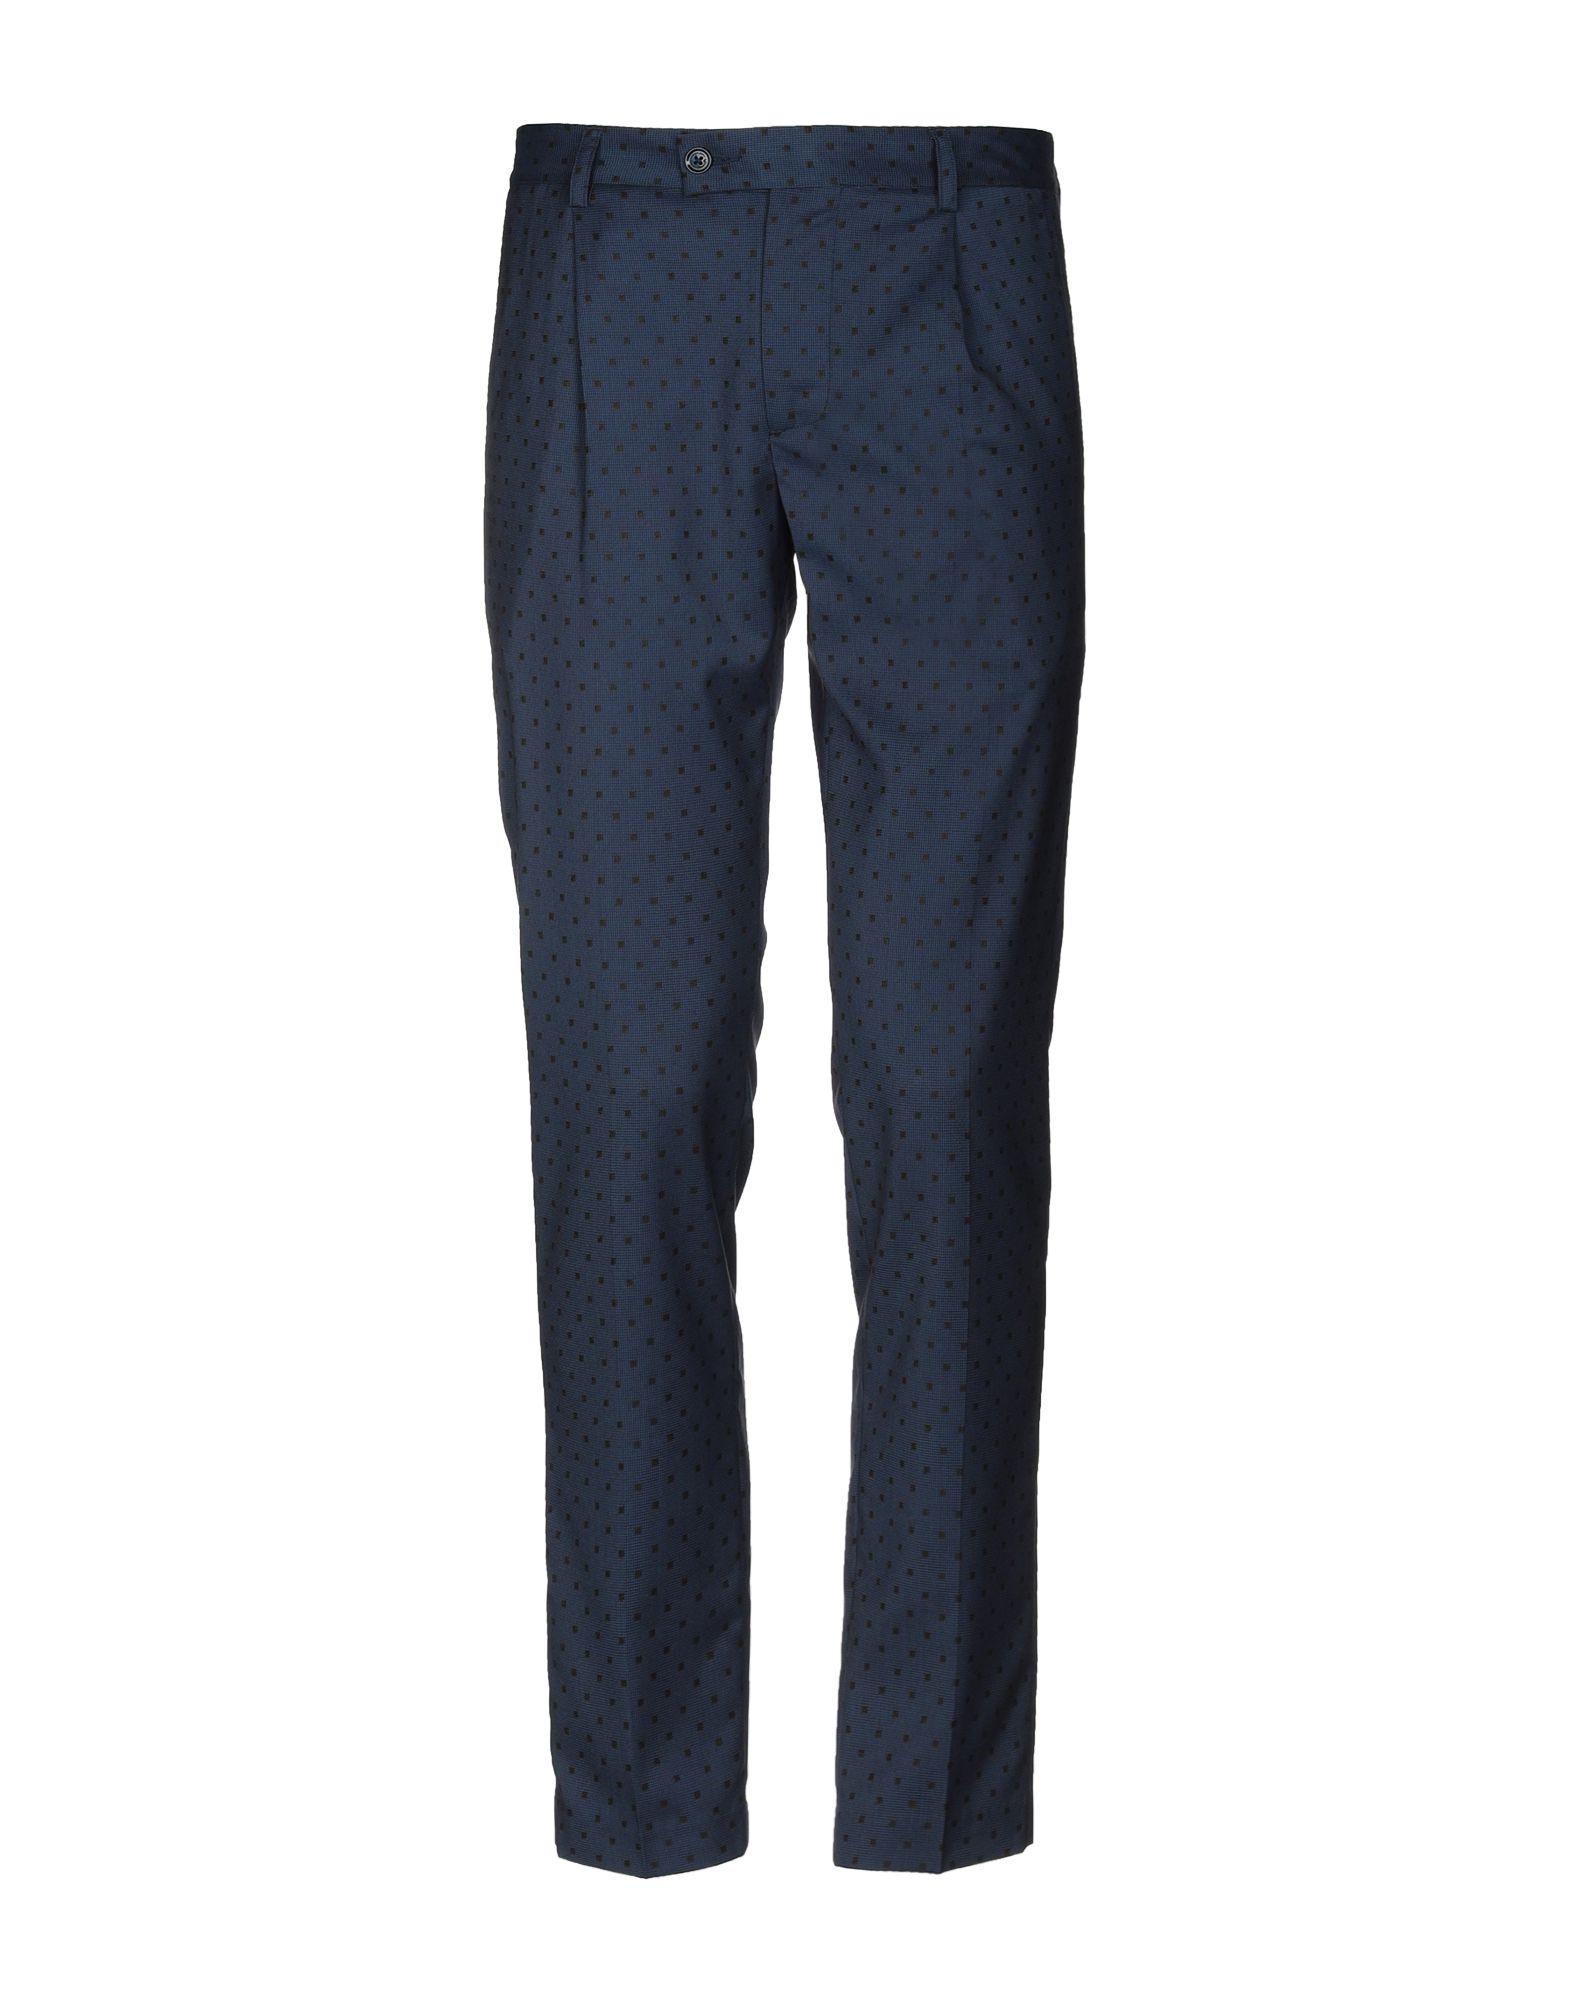 Pantalone Pantalone Pantalone Daniele Alessandrini uomo - 13248489CK e12